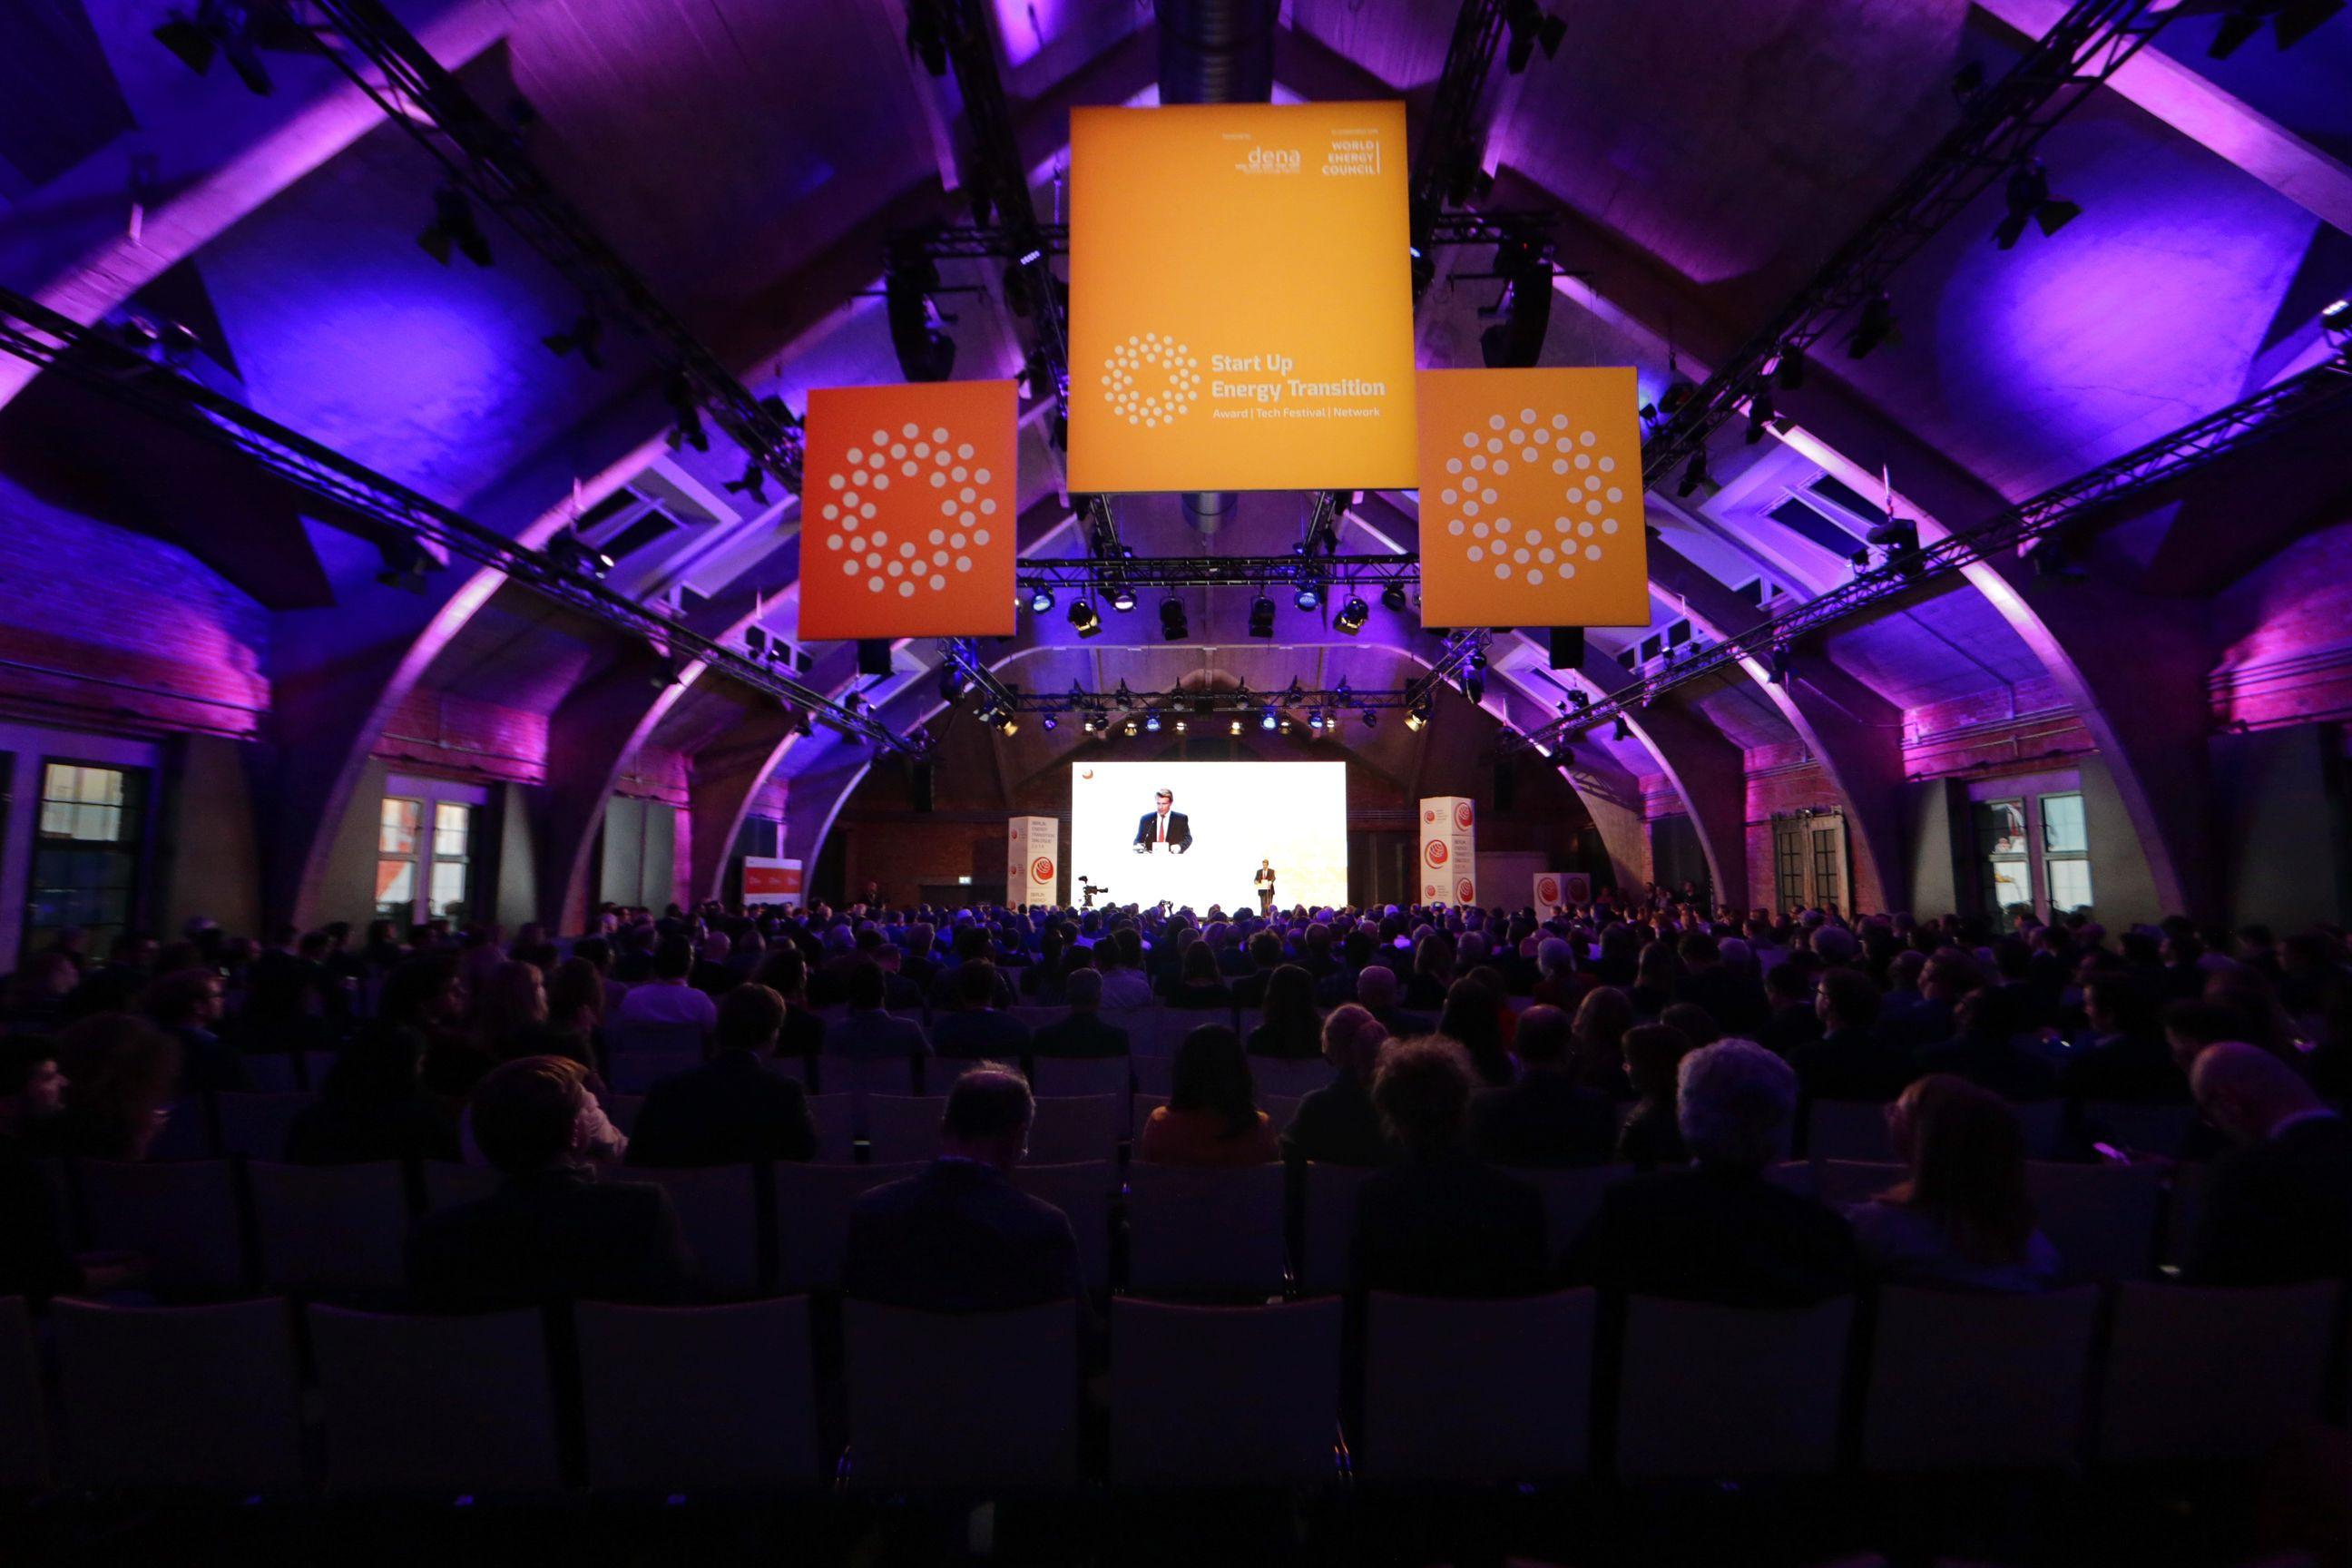 SET Award 2019 honours five start-ups in the fields of